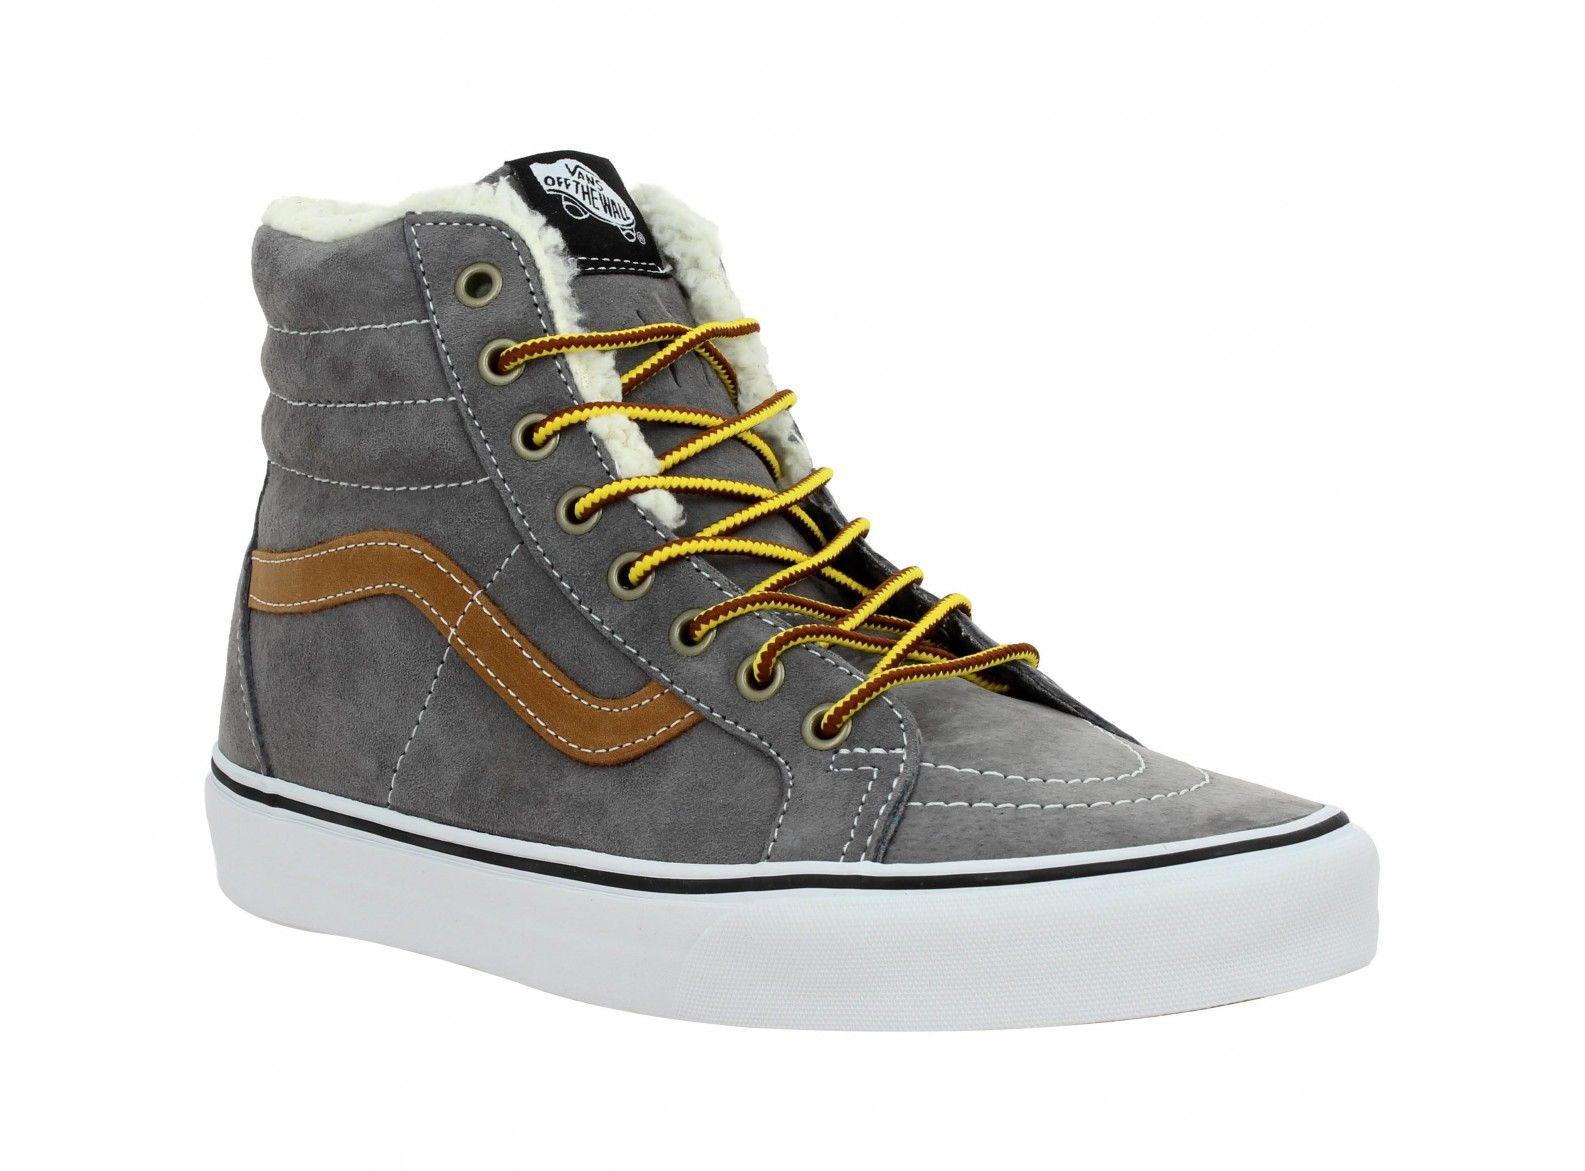 Vans Chaussures homme Vans Basket Sk8 High Reissue